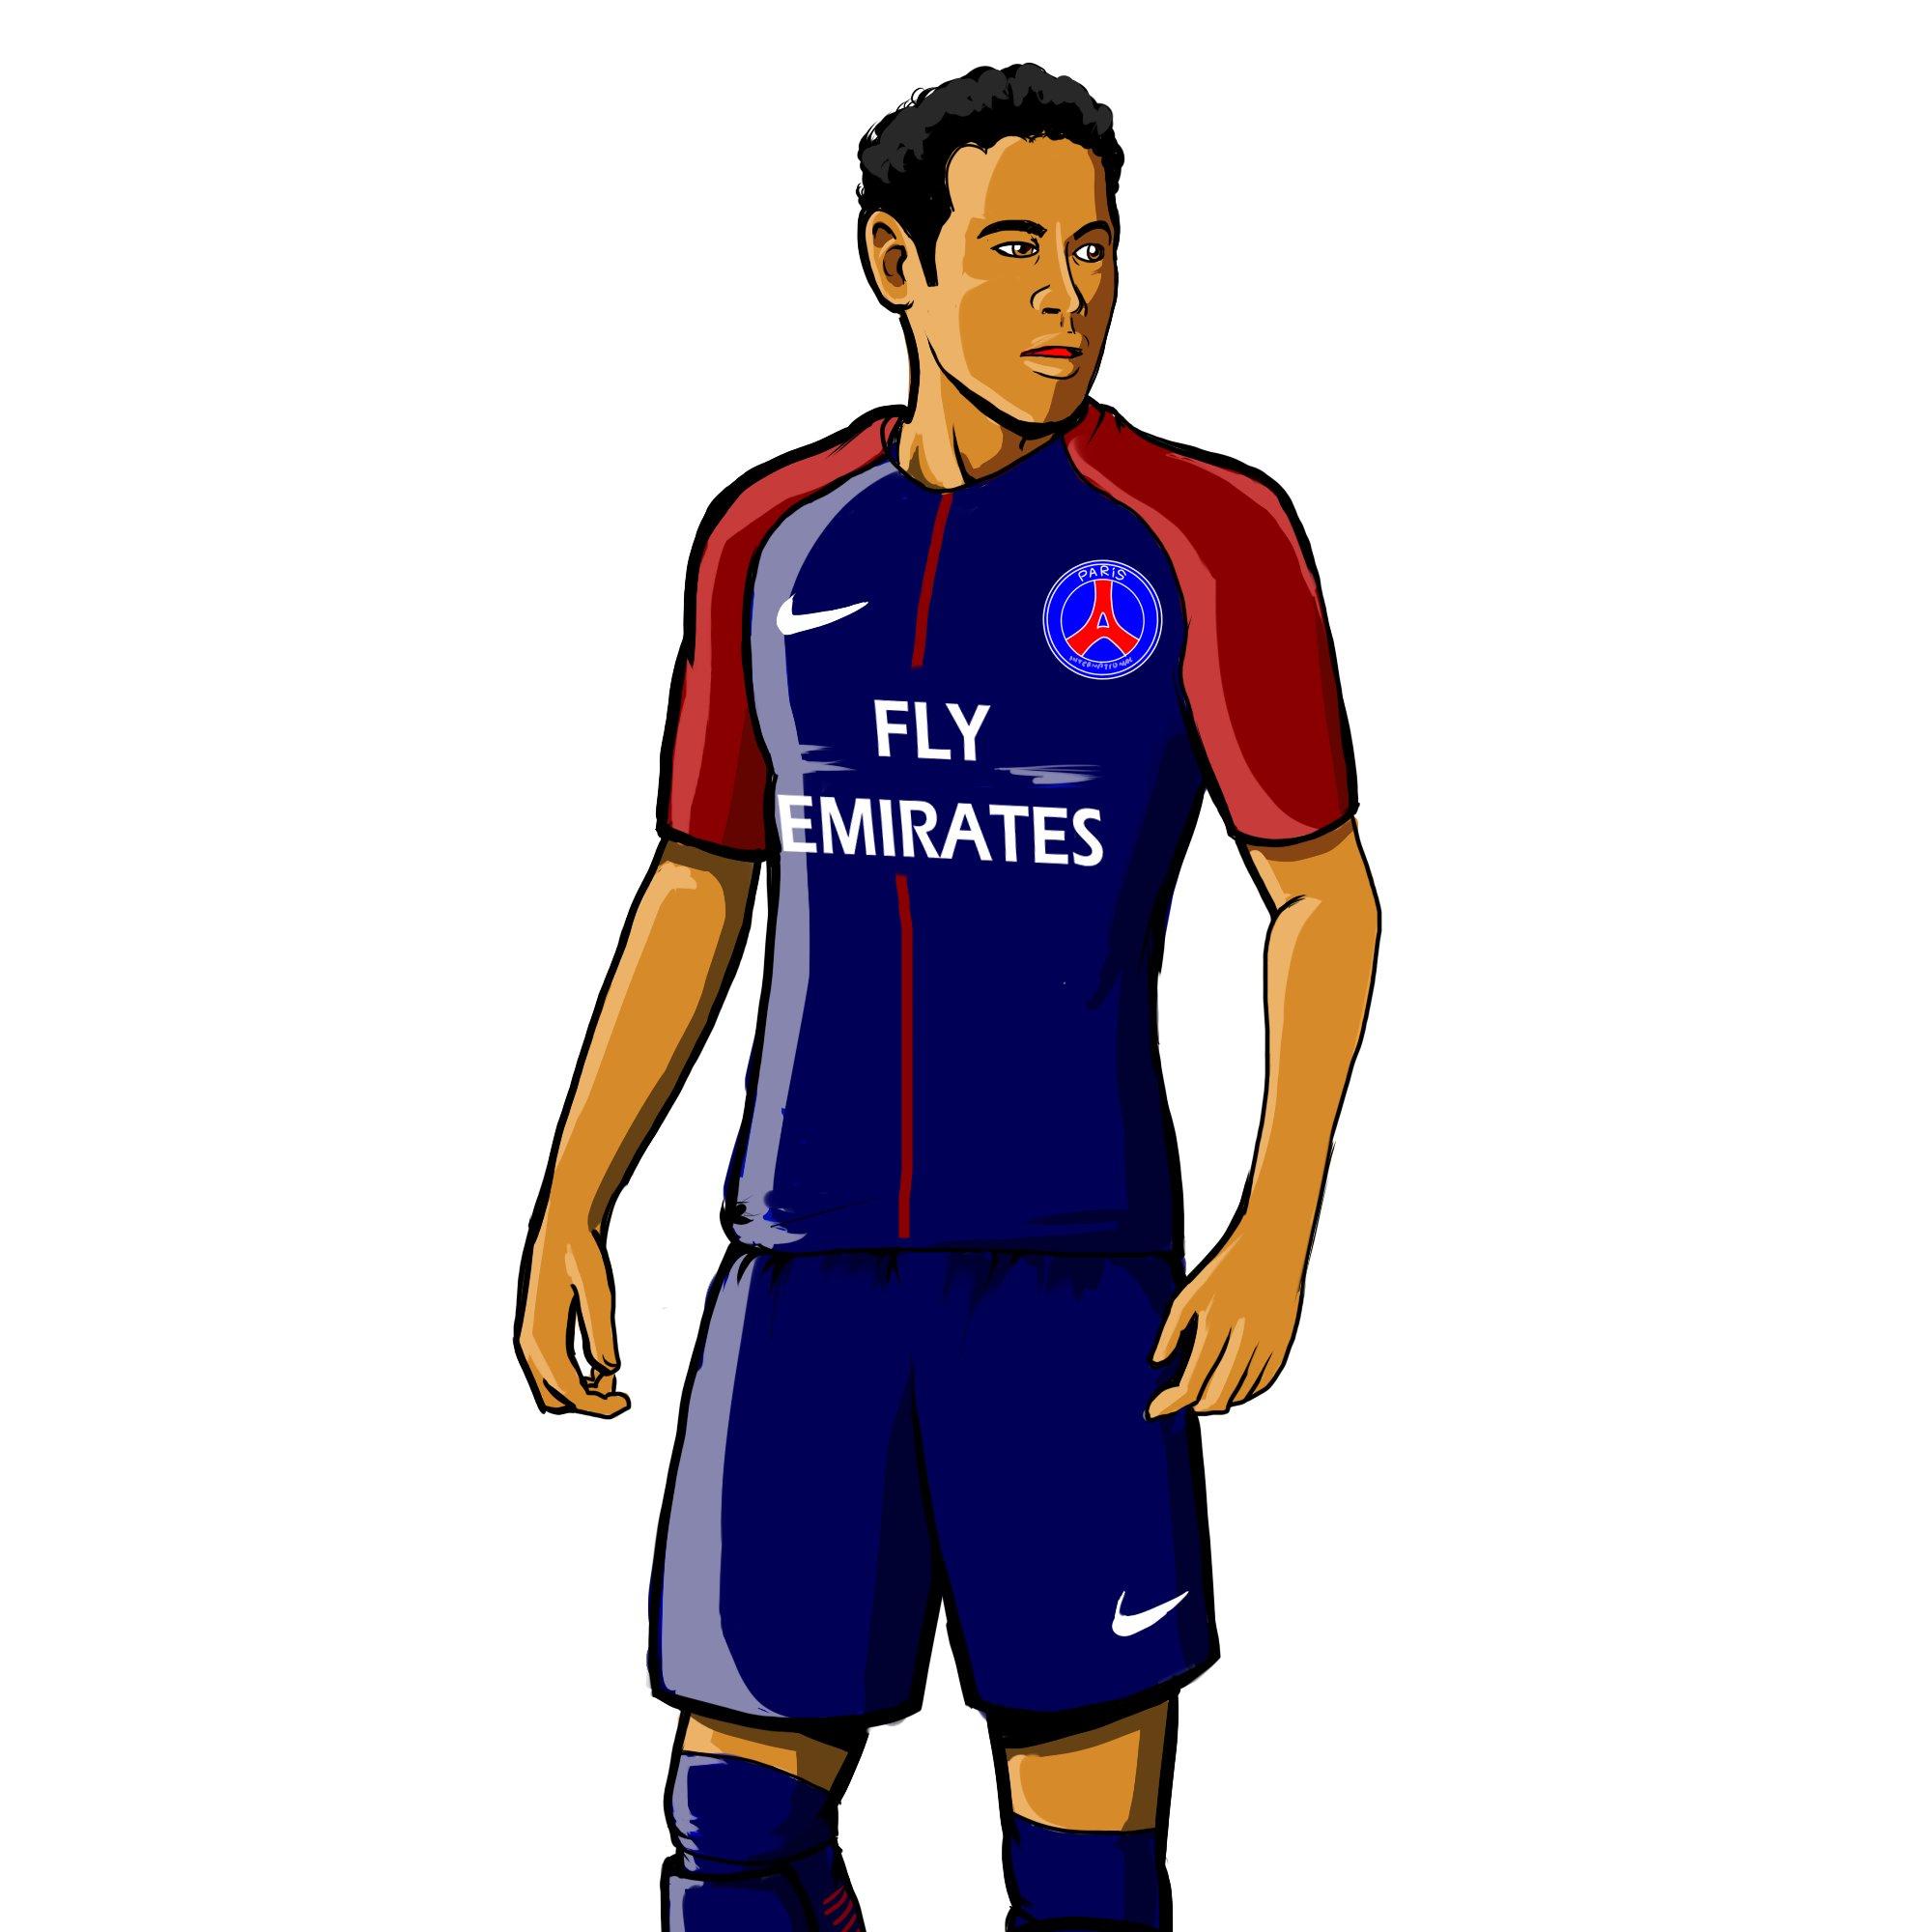 Psg: Neymar 11 PSG (@neymar11paris)